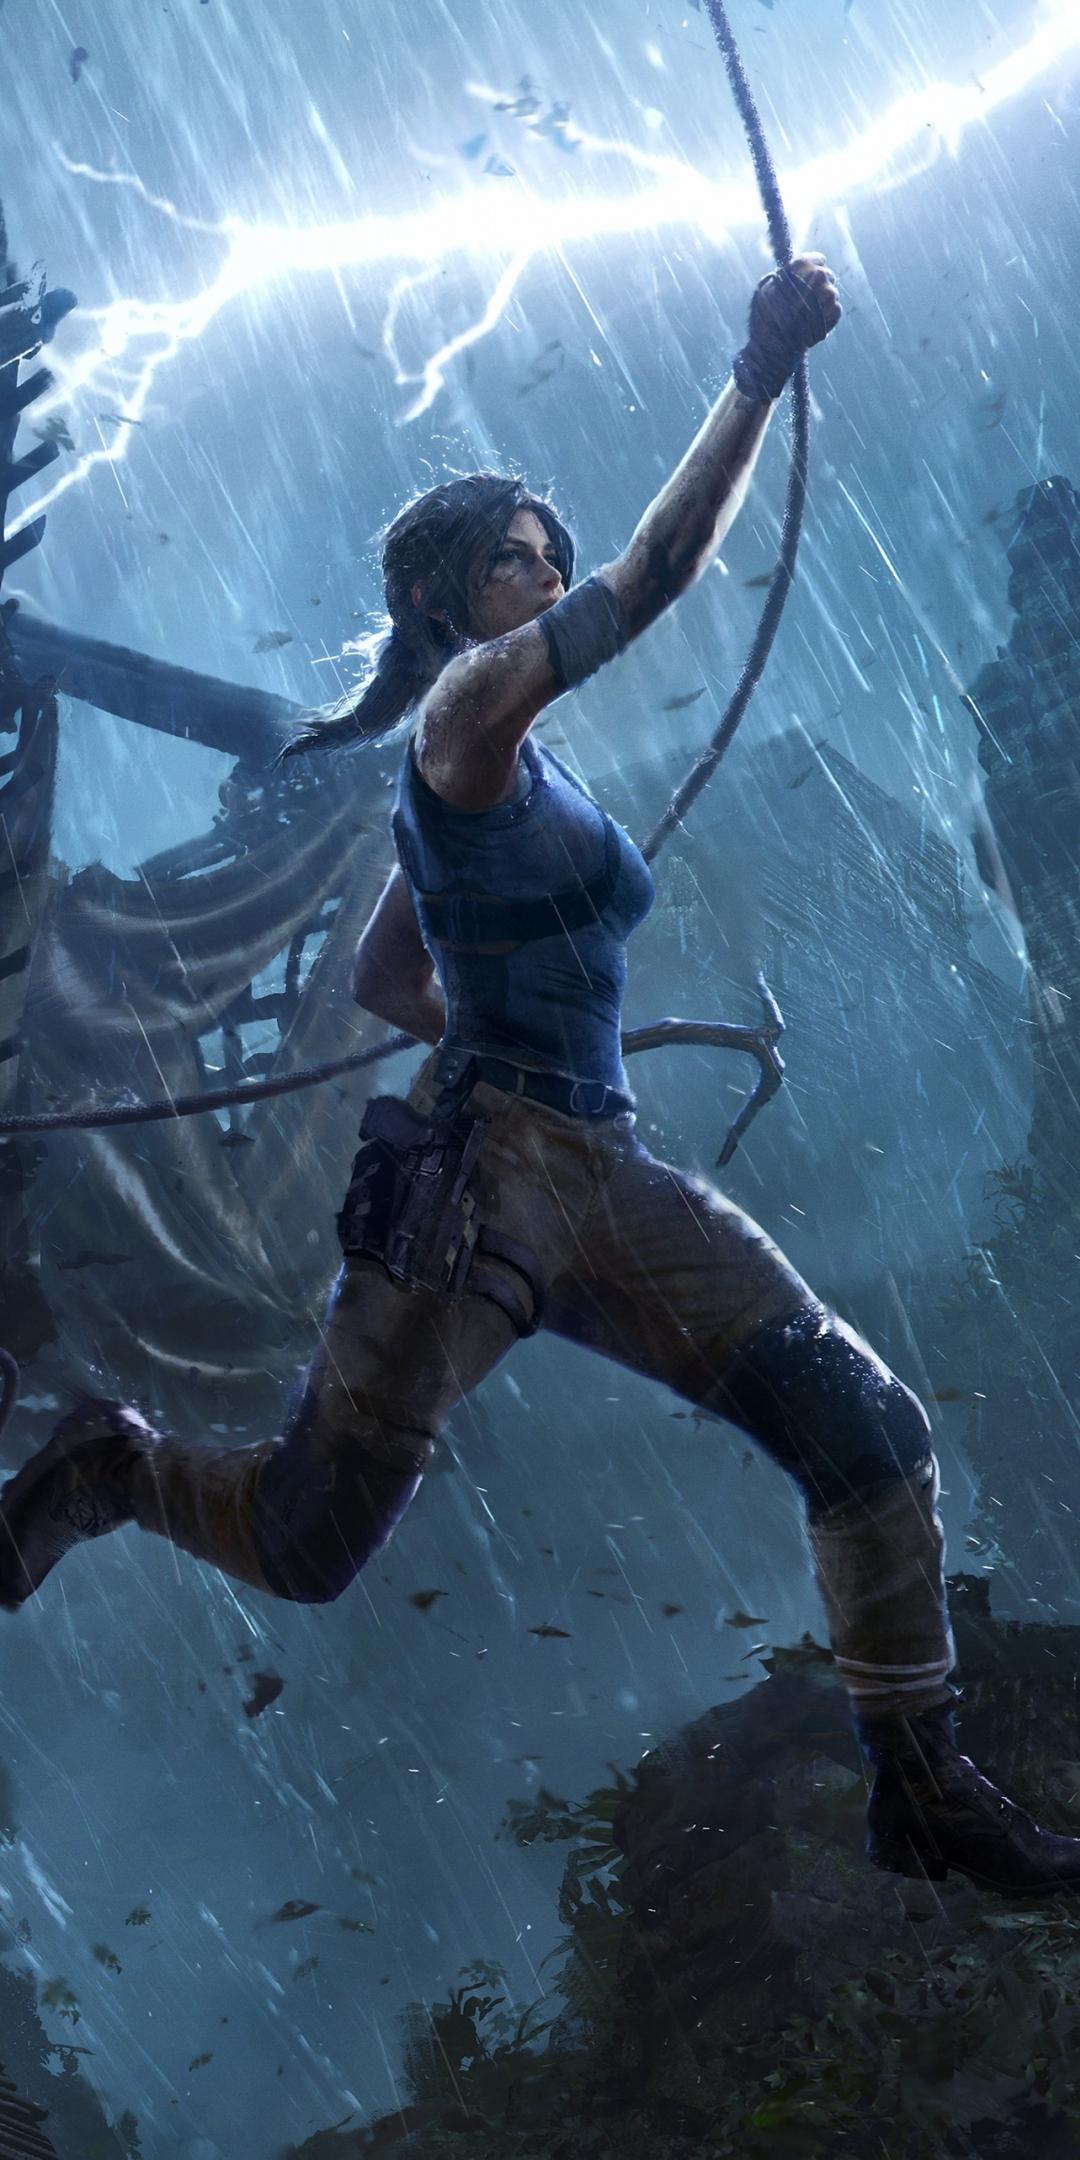 Tomb Raider Legend Wallpapers - Top Free Tomb Raider